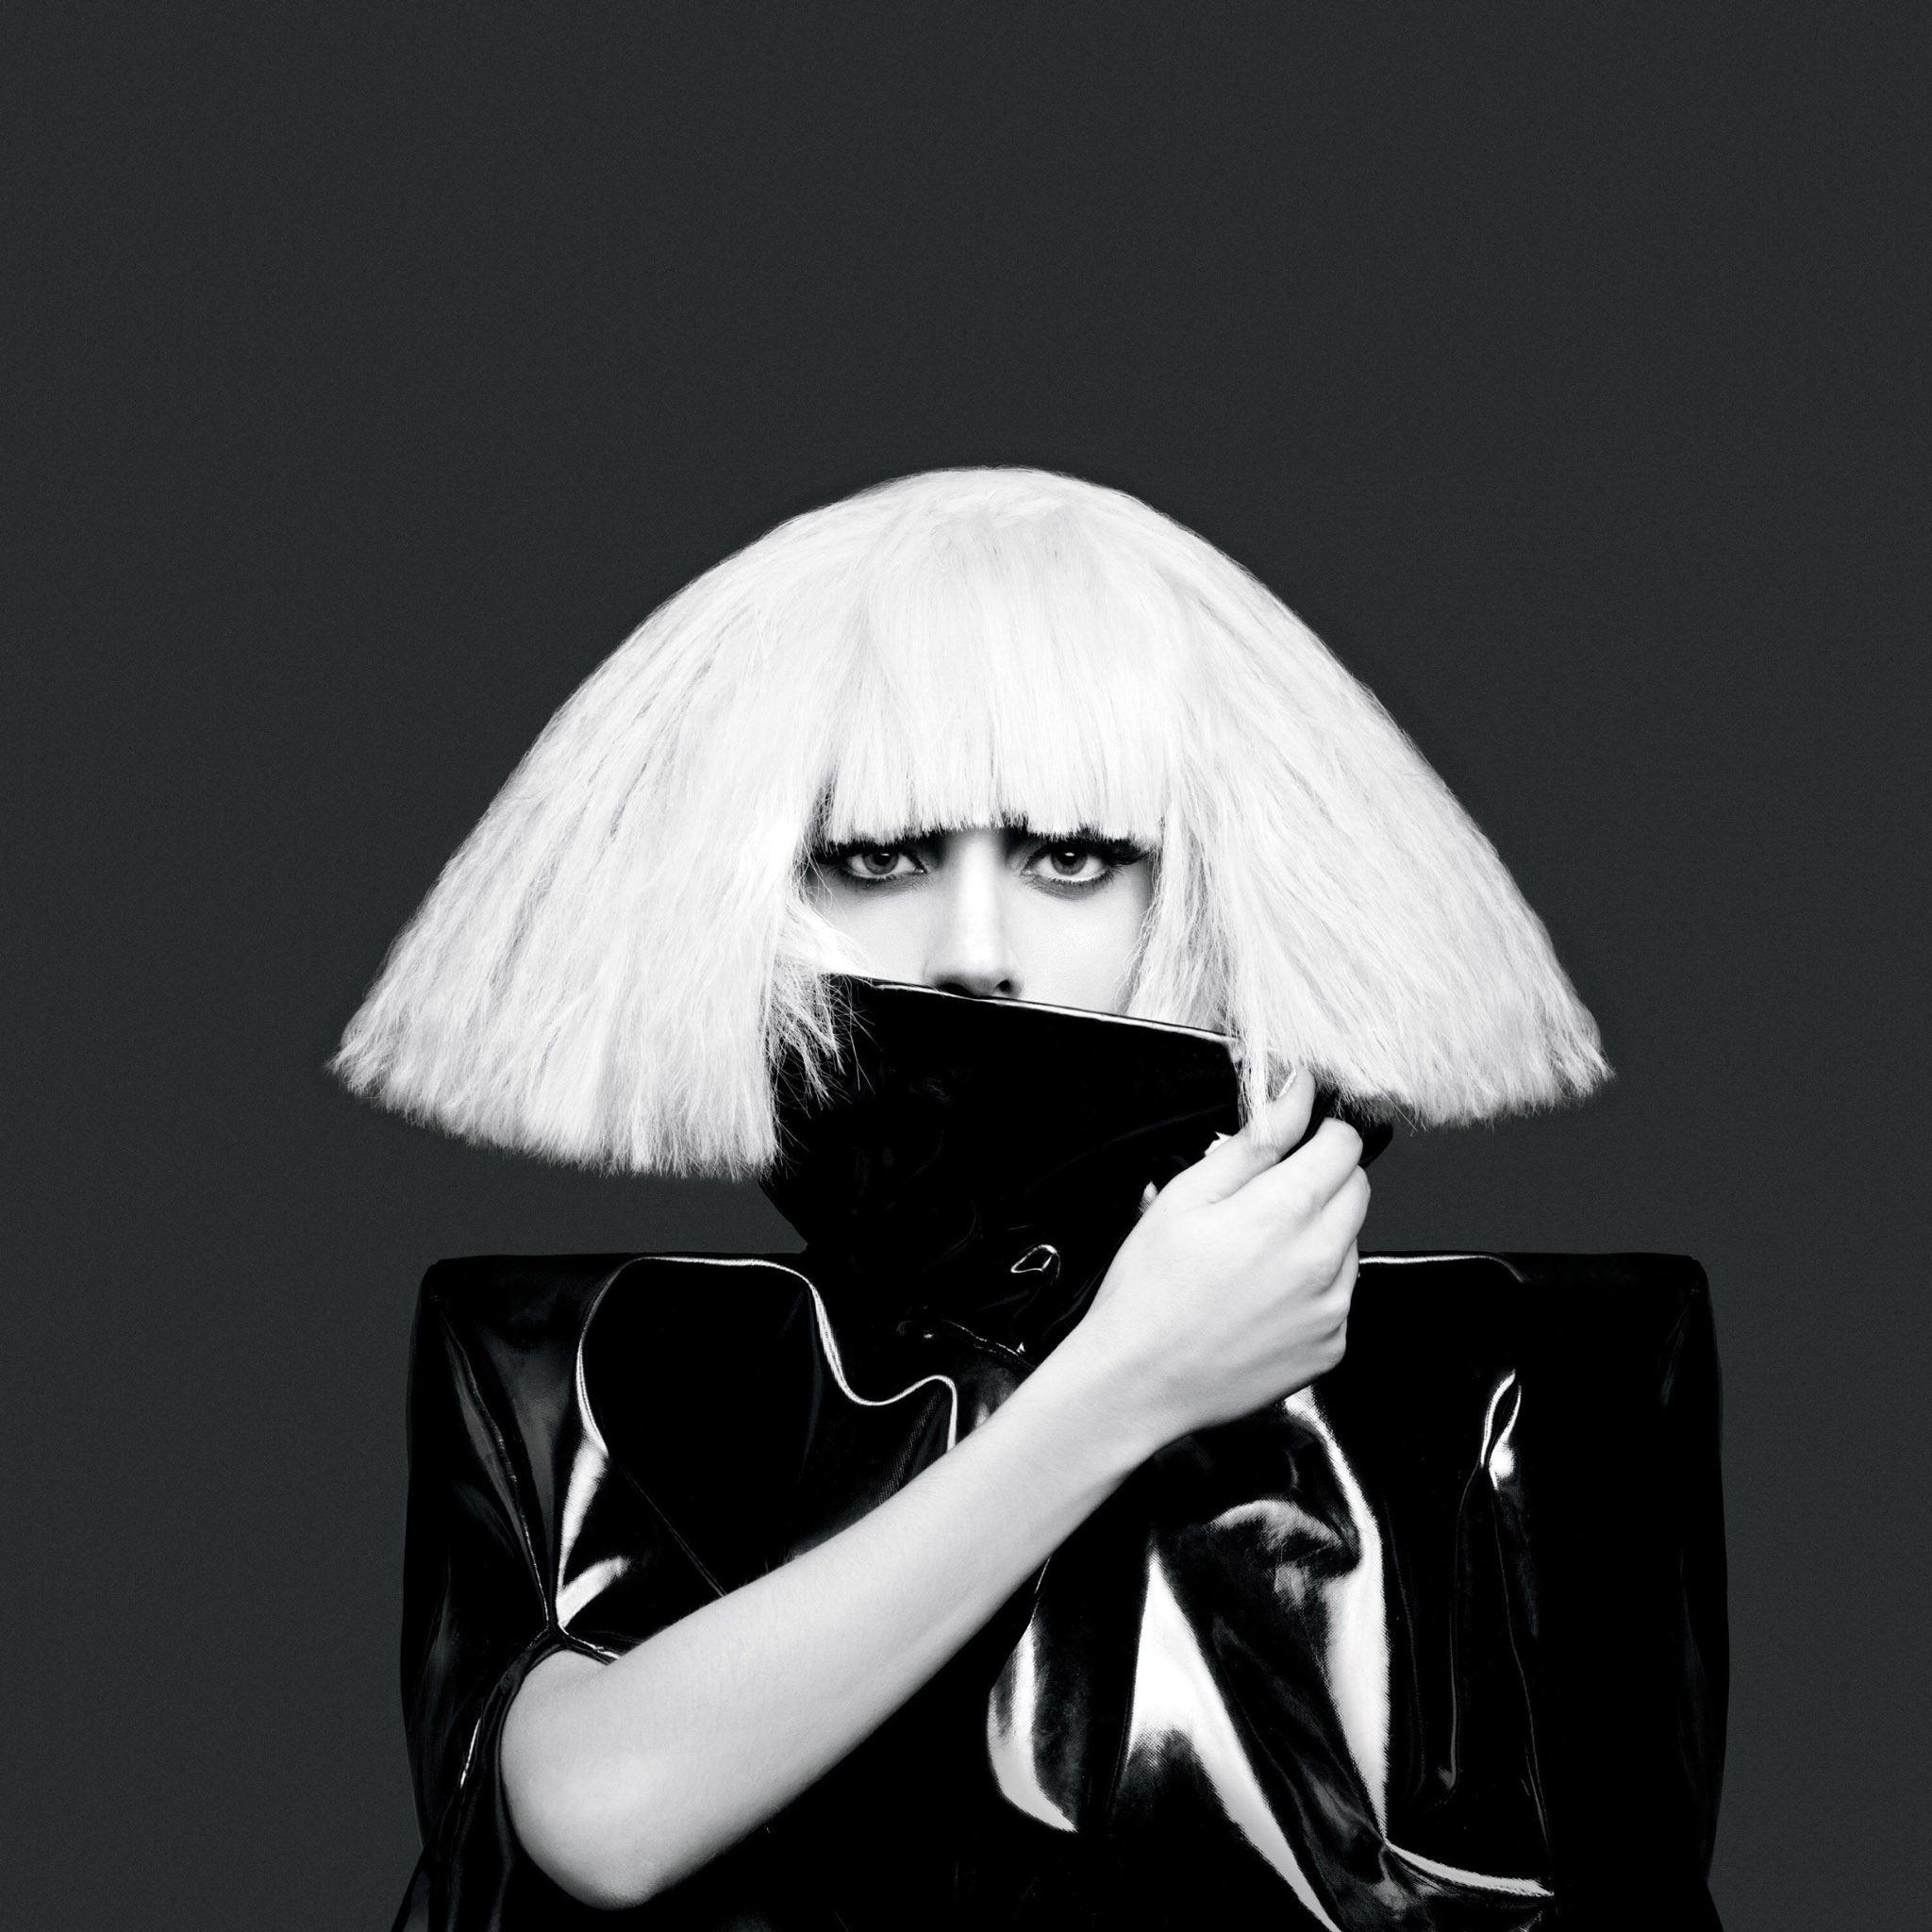 Super Star Lady Gaga iPad Air wallpaper